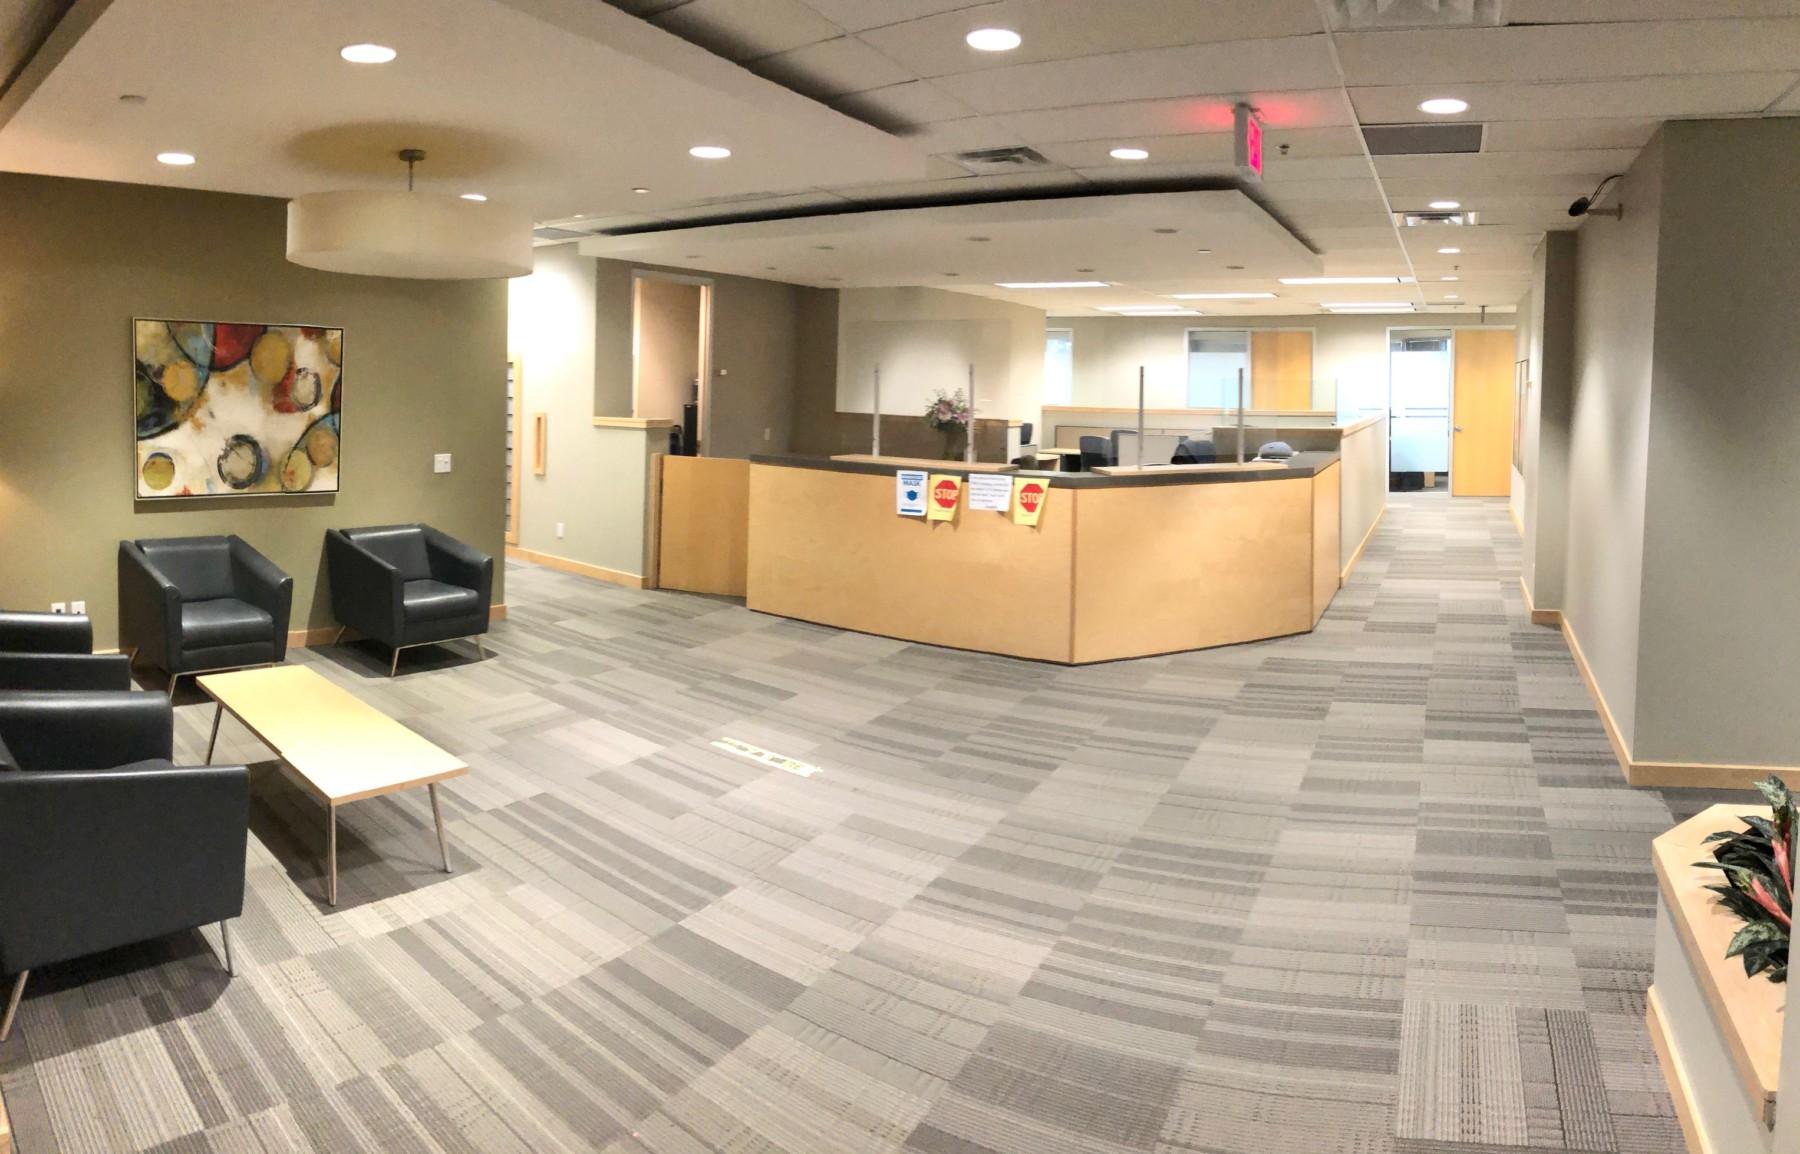 JM Nutrition Scarborough office inside the suite waiting area